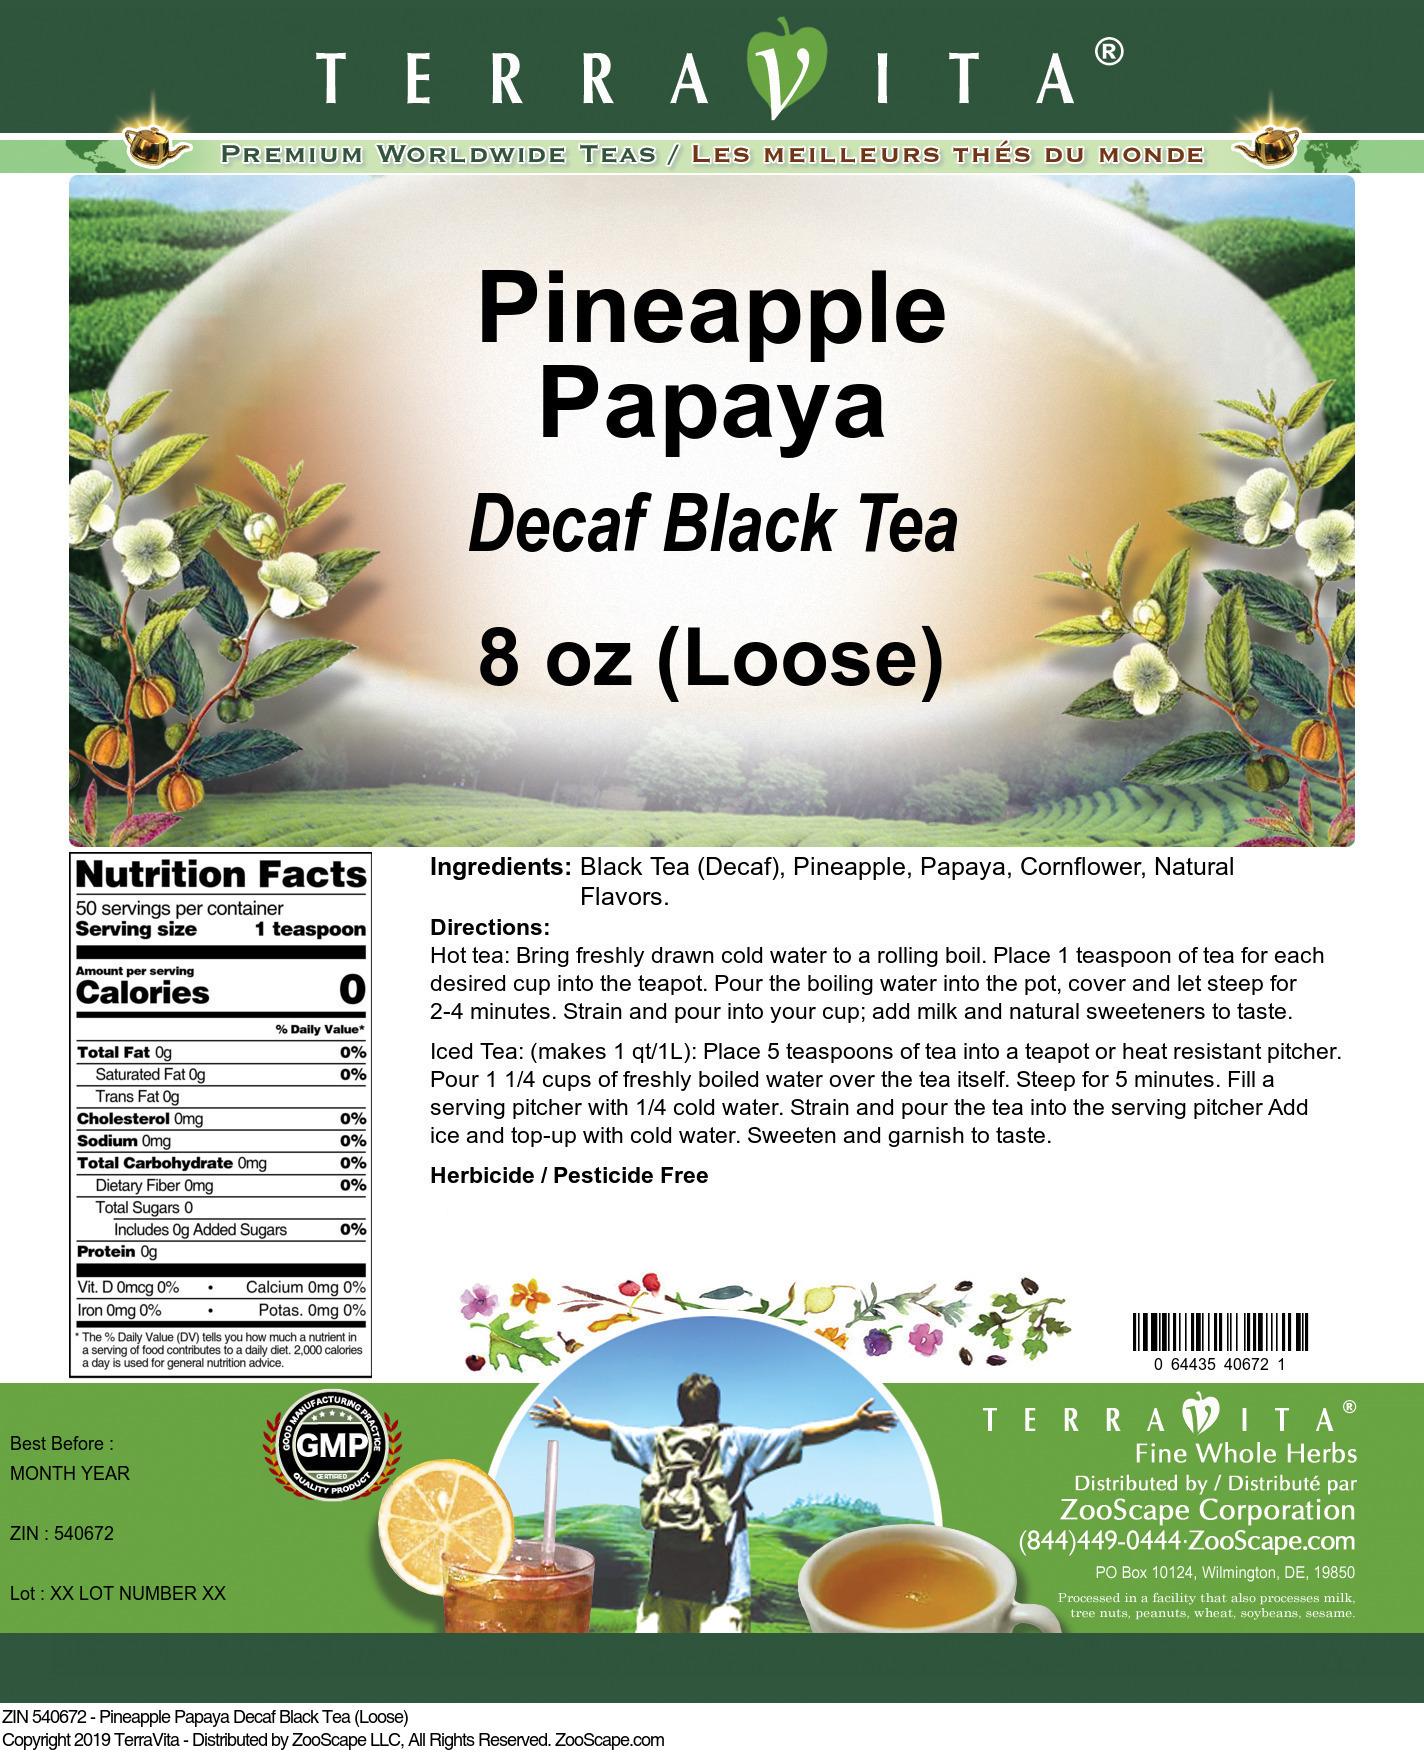 Pineapple Papaya Decaf Black Tea (Loose)